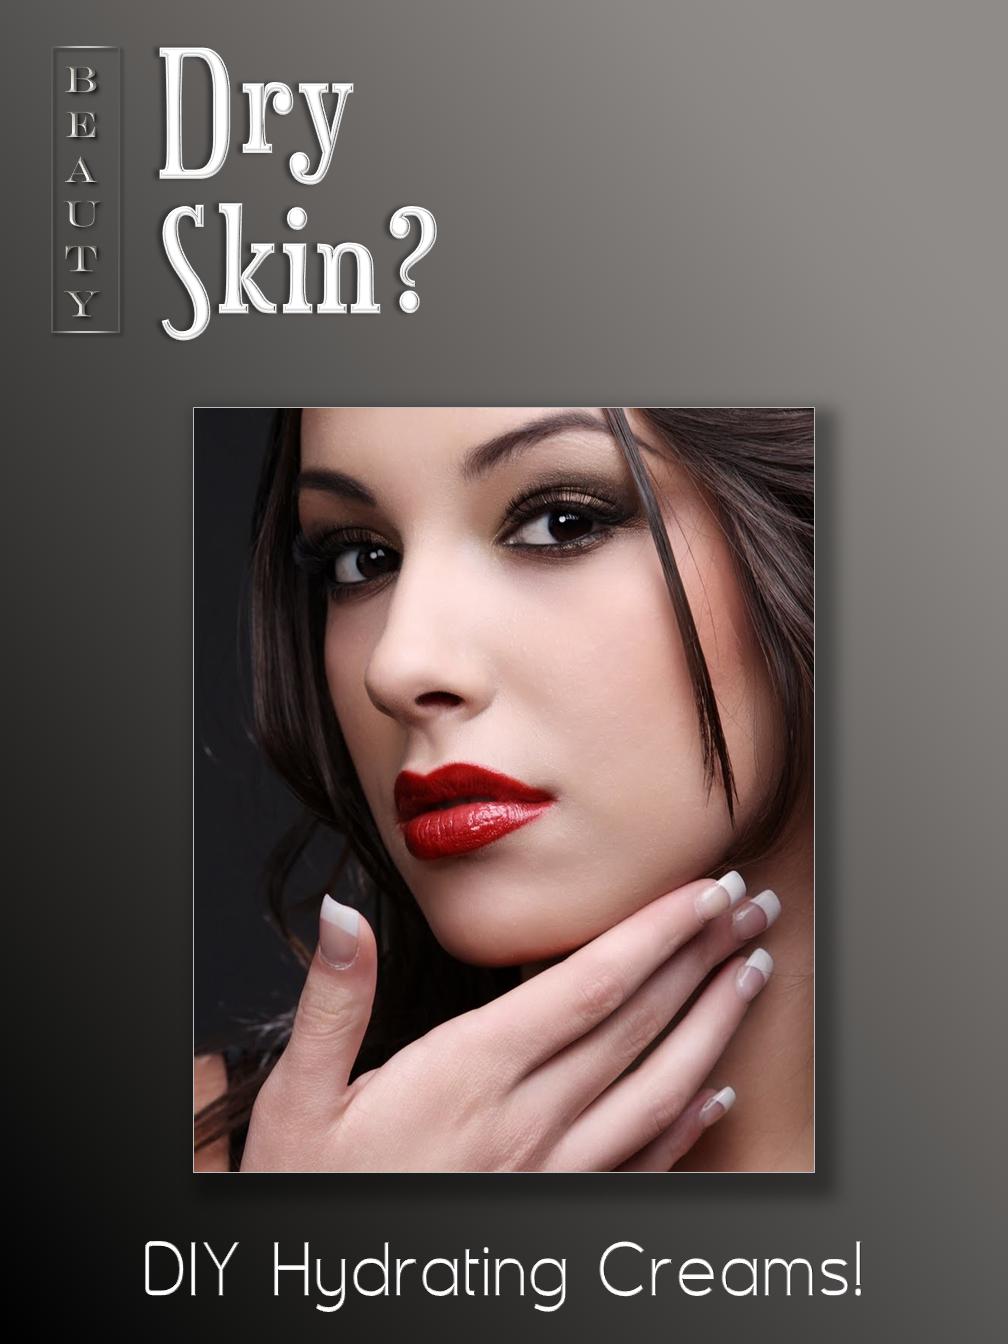 Dry Skin?